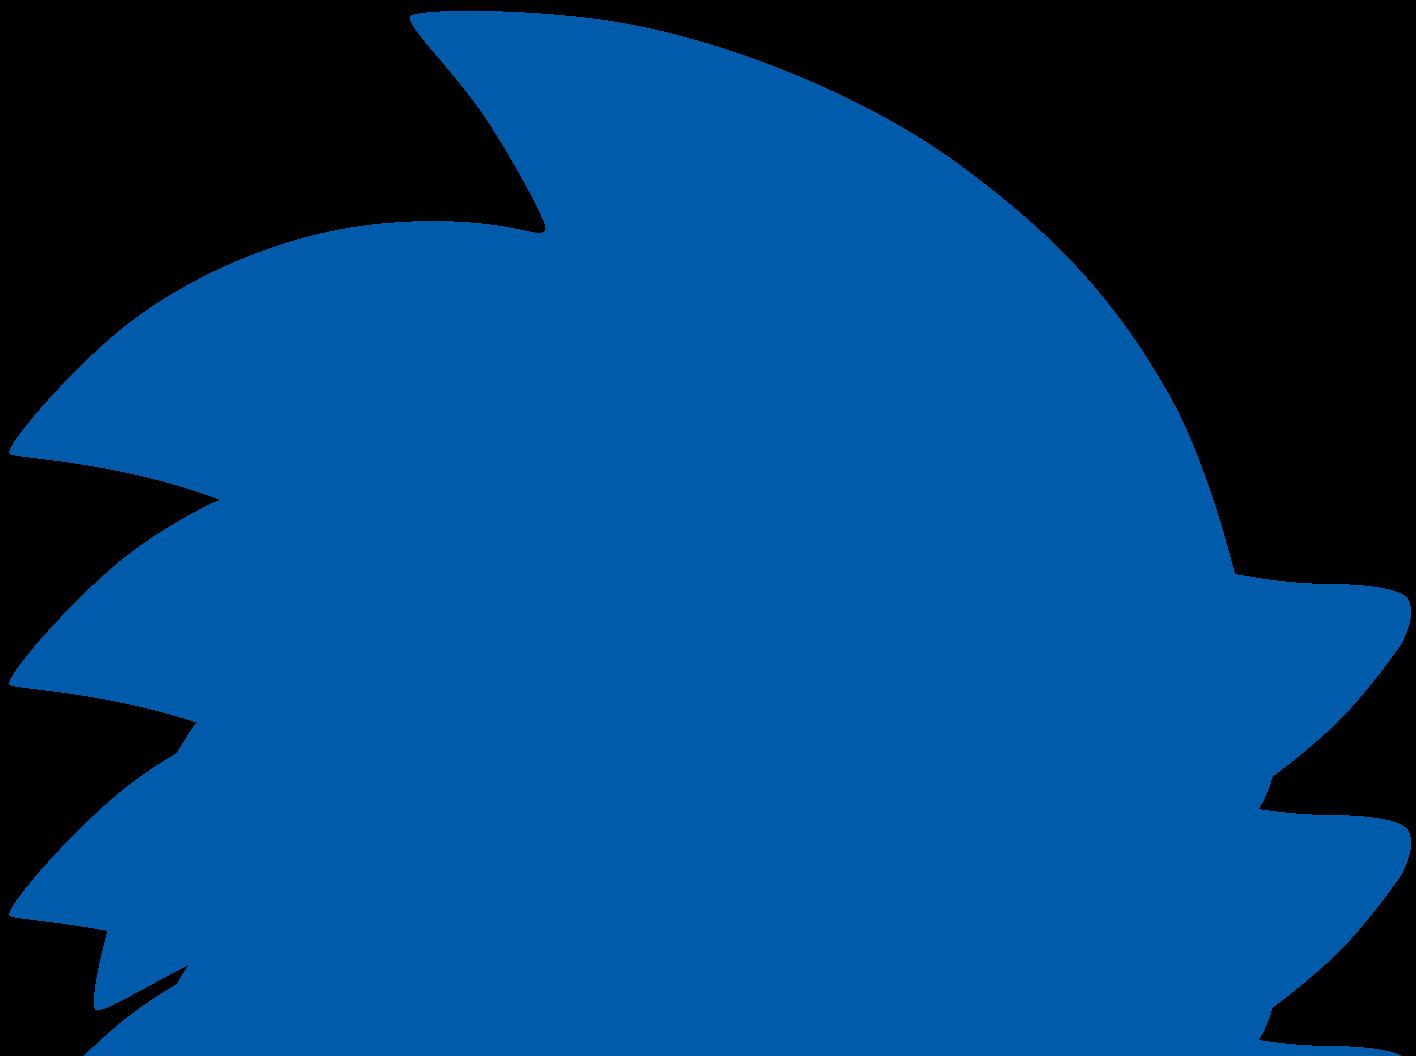 Dolphin clipart superhero. Image sonic tshirt head